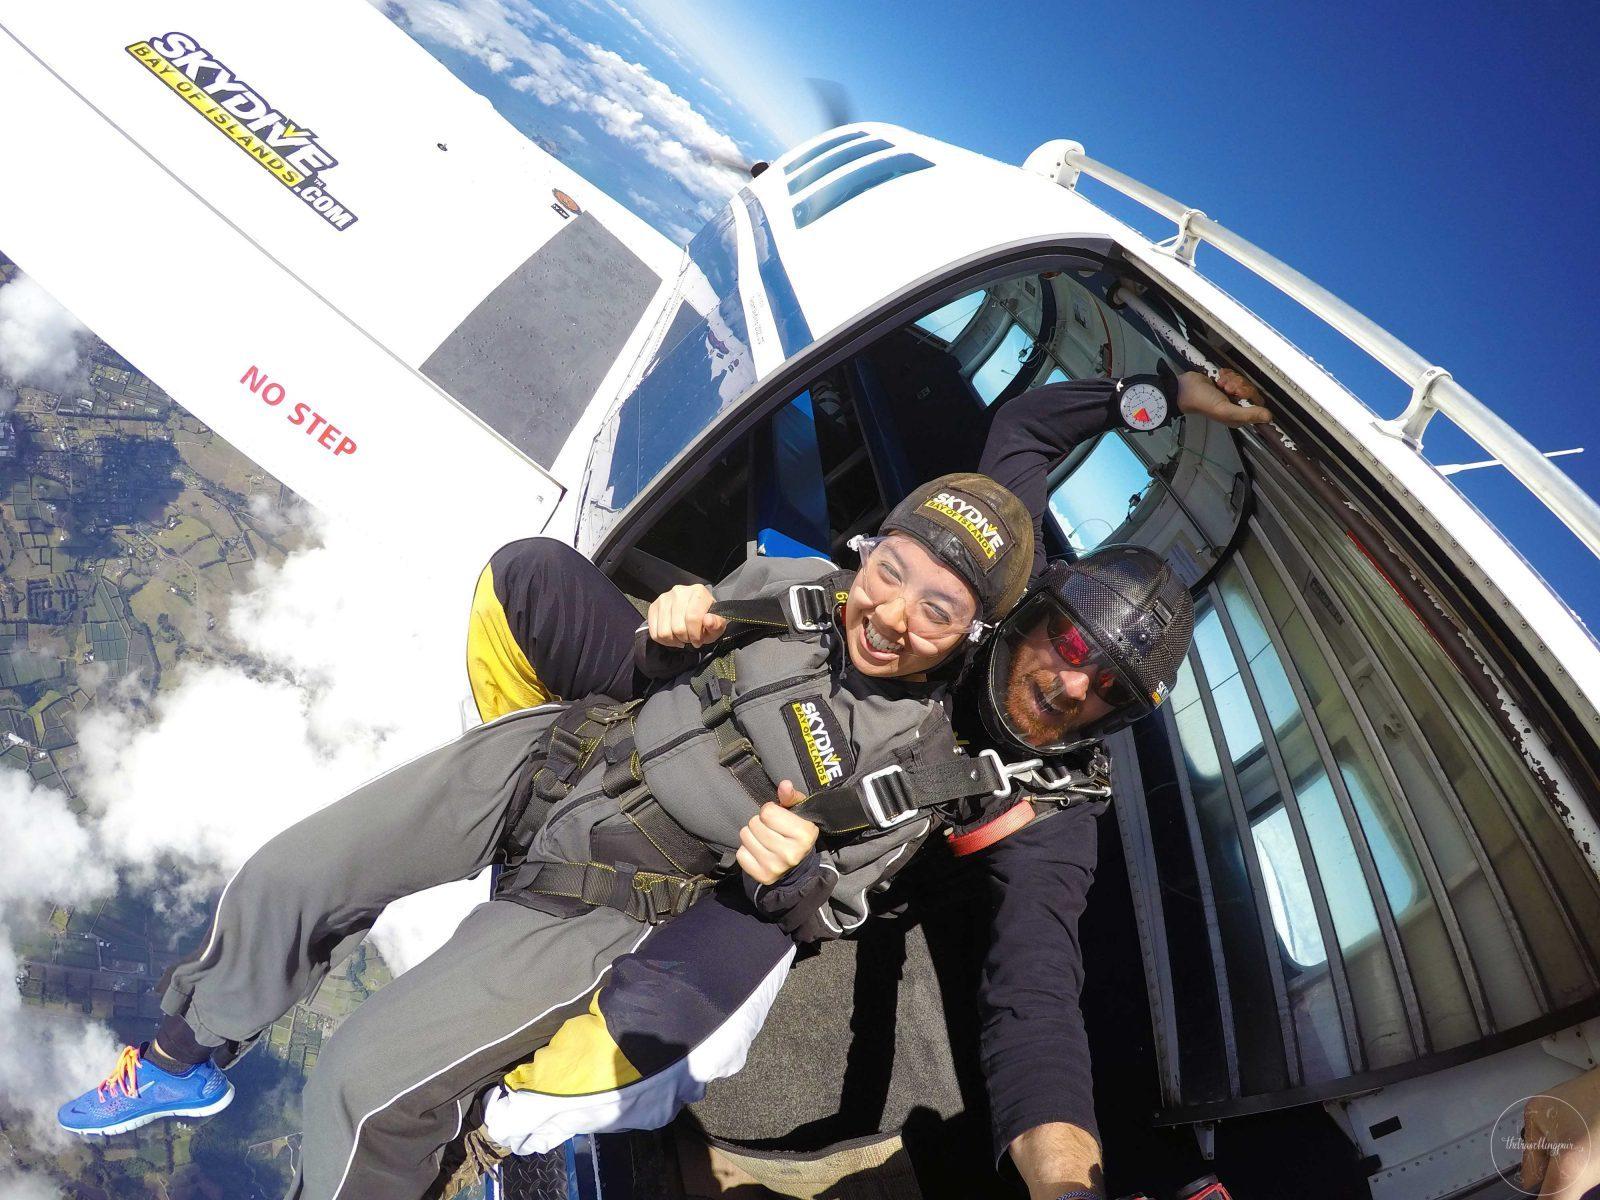 Bay of Islands Skydiving